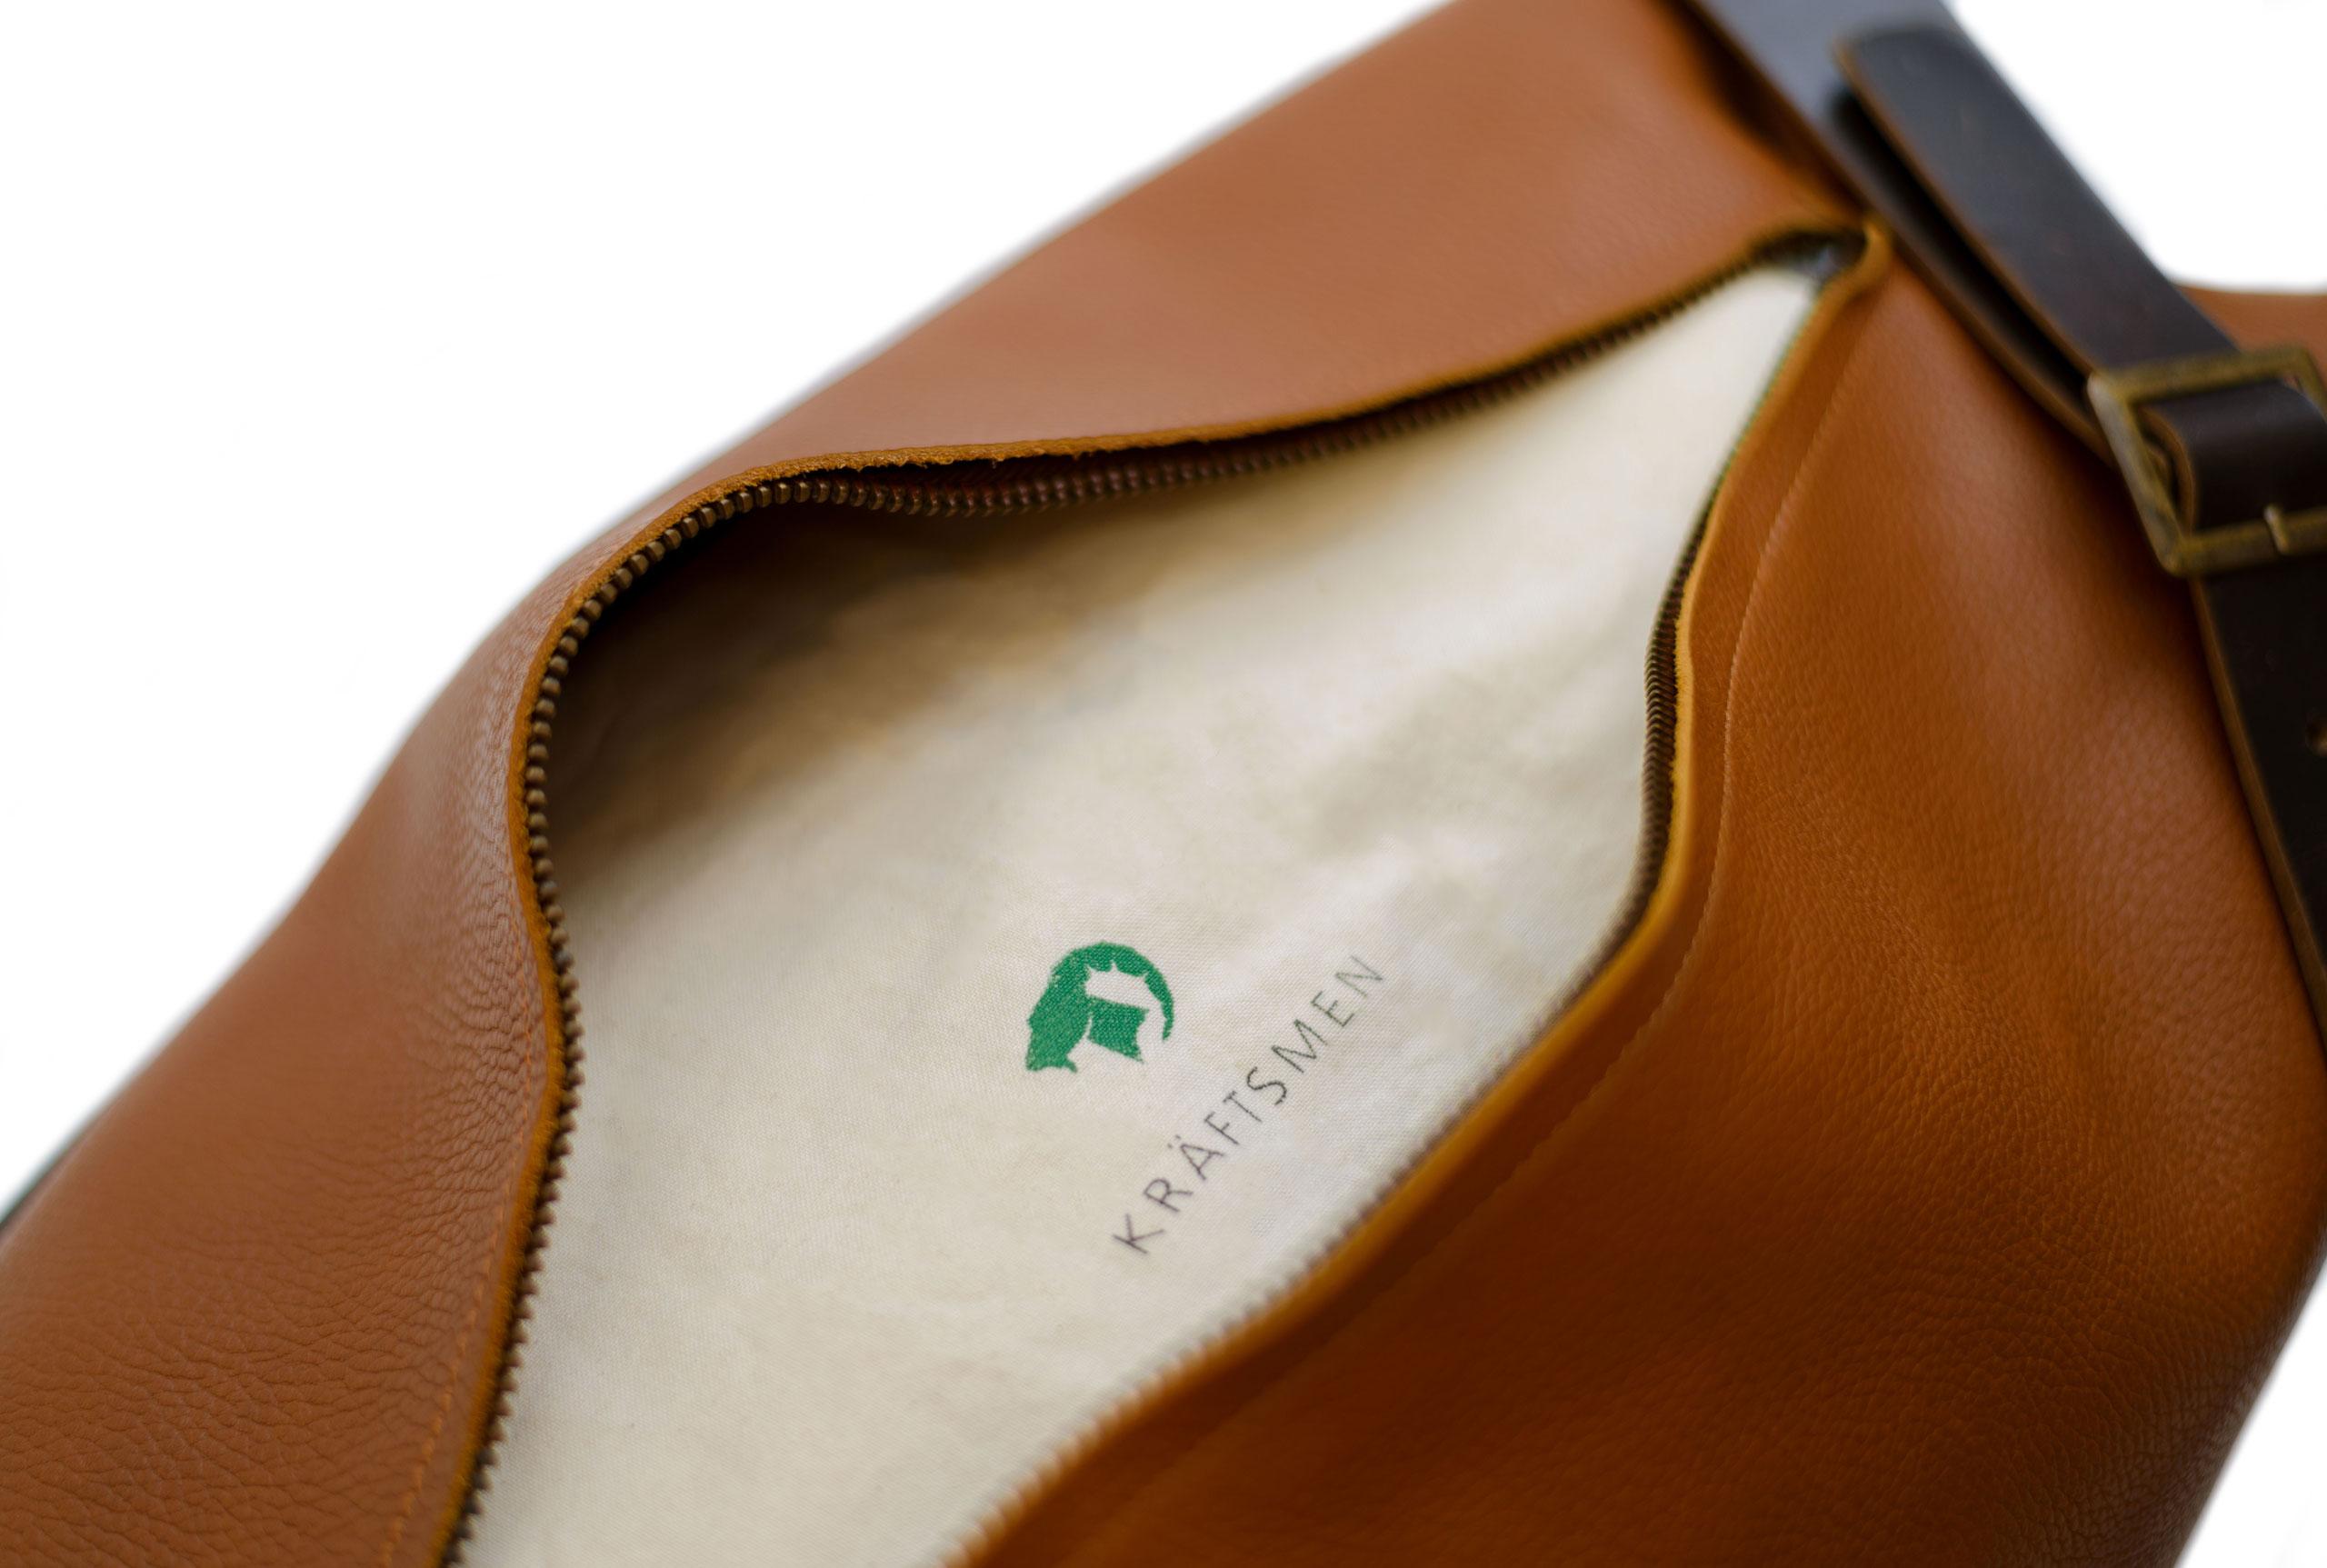 Leather duffle bag by Kraftsmen